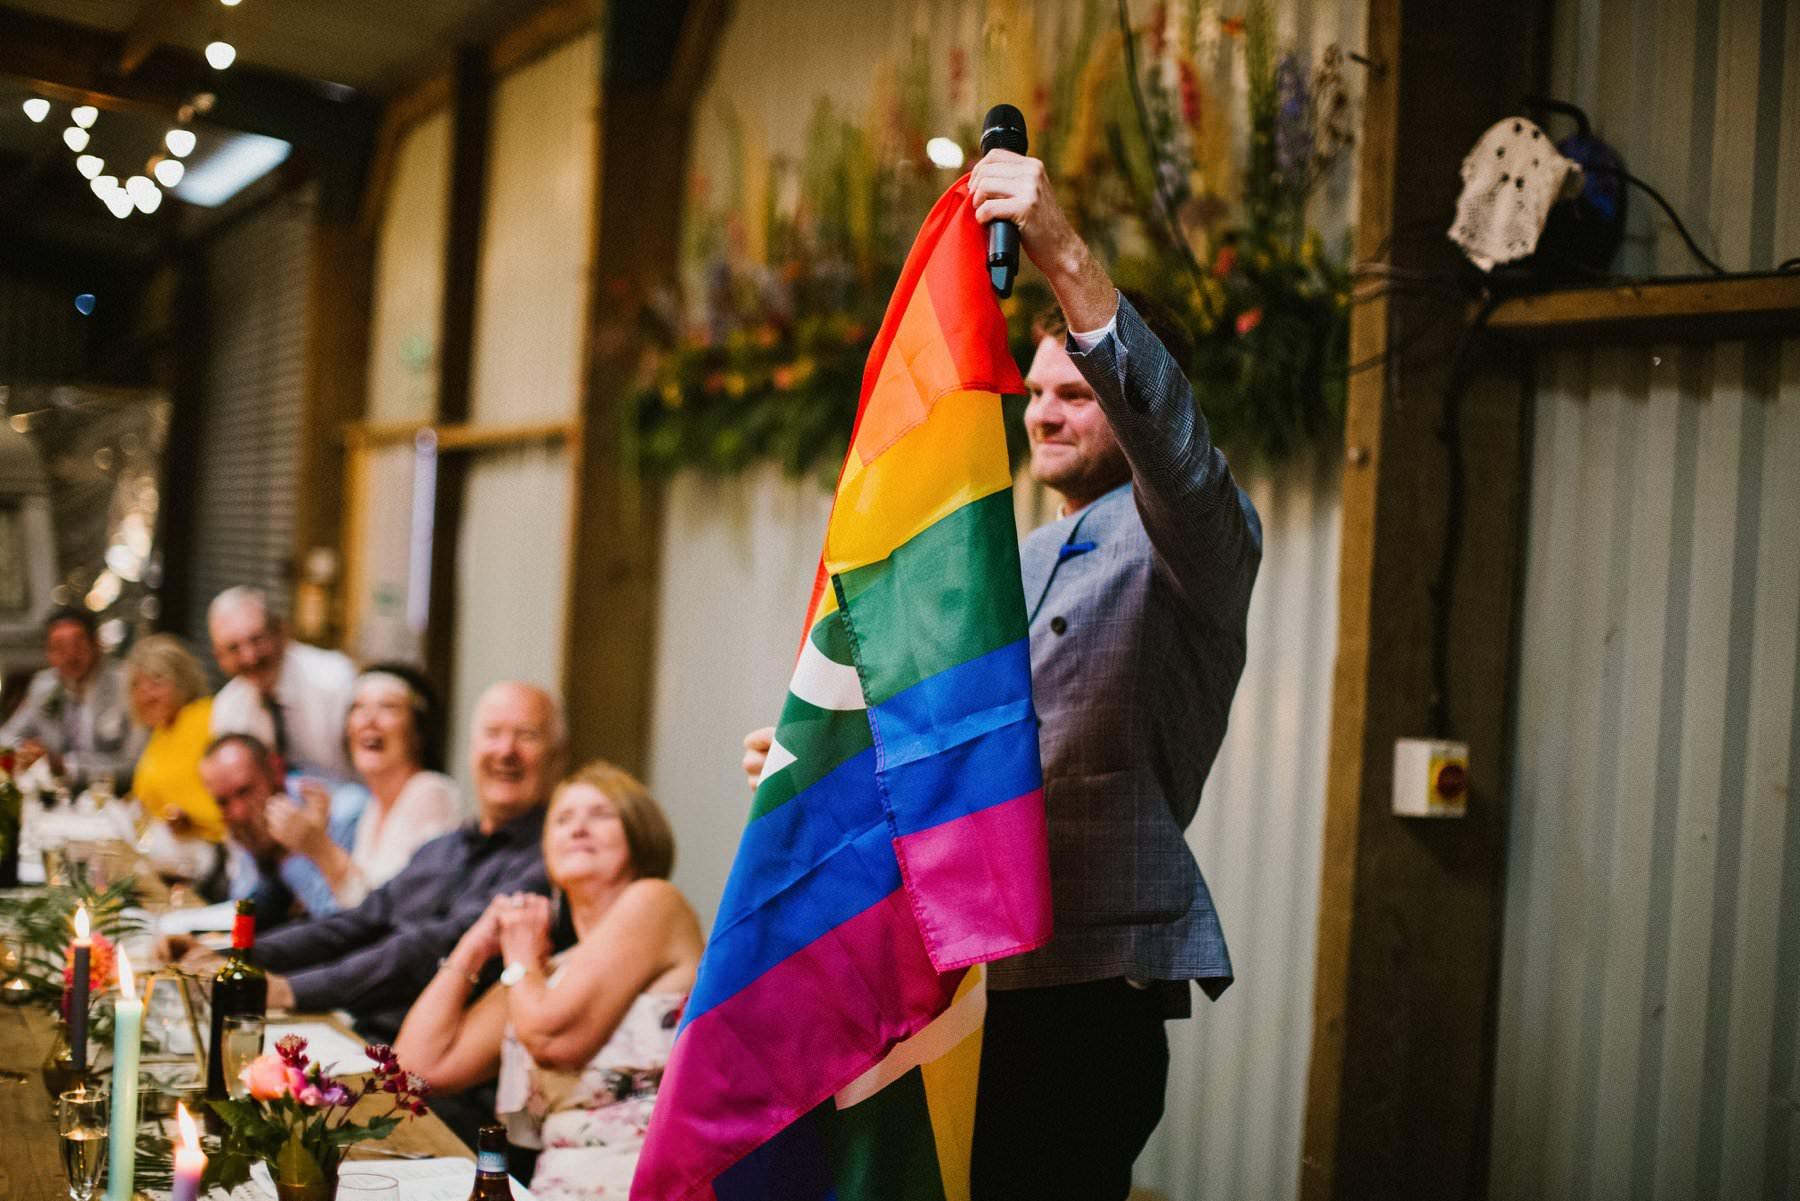 best man holding pride flag during speeches at wedding in Norfolk